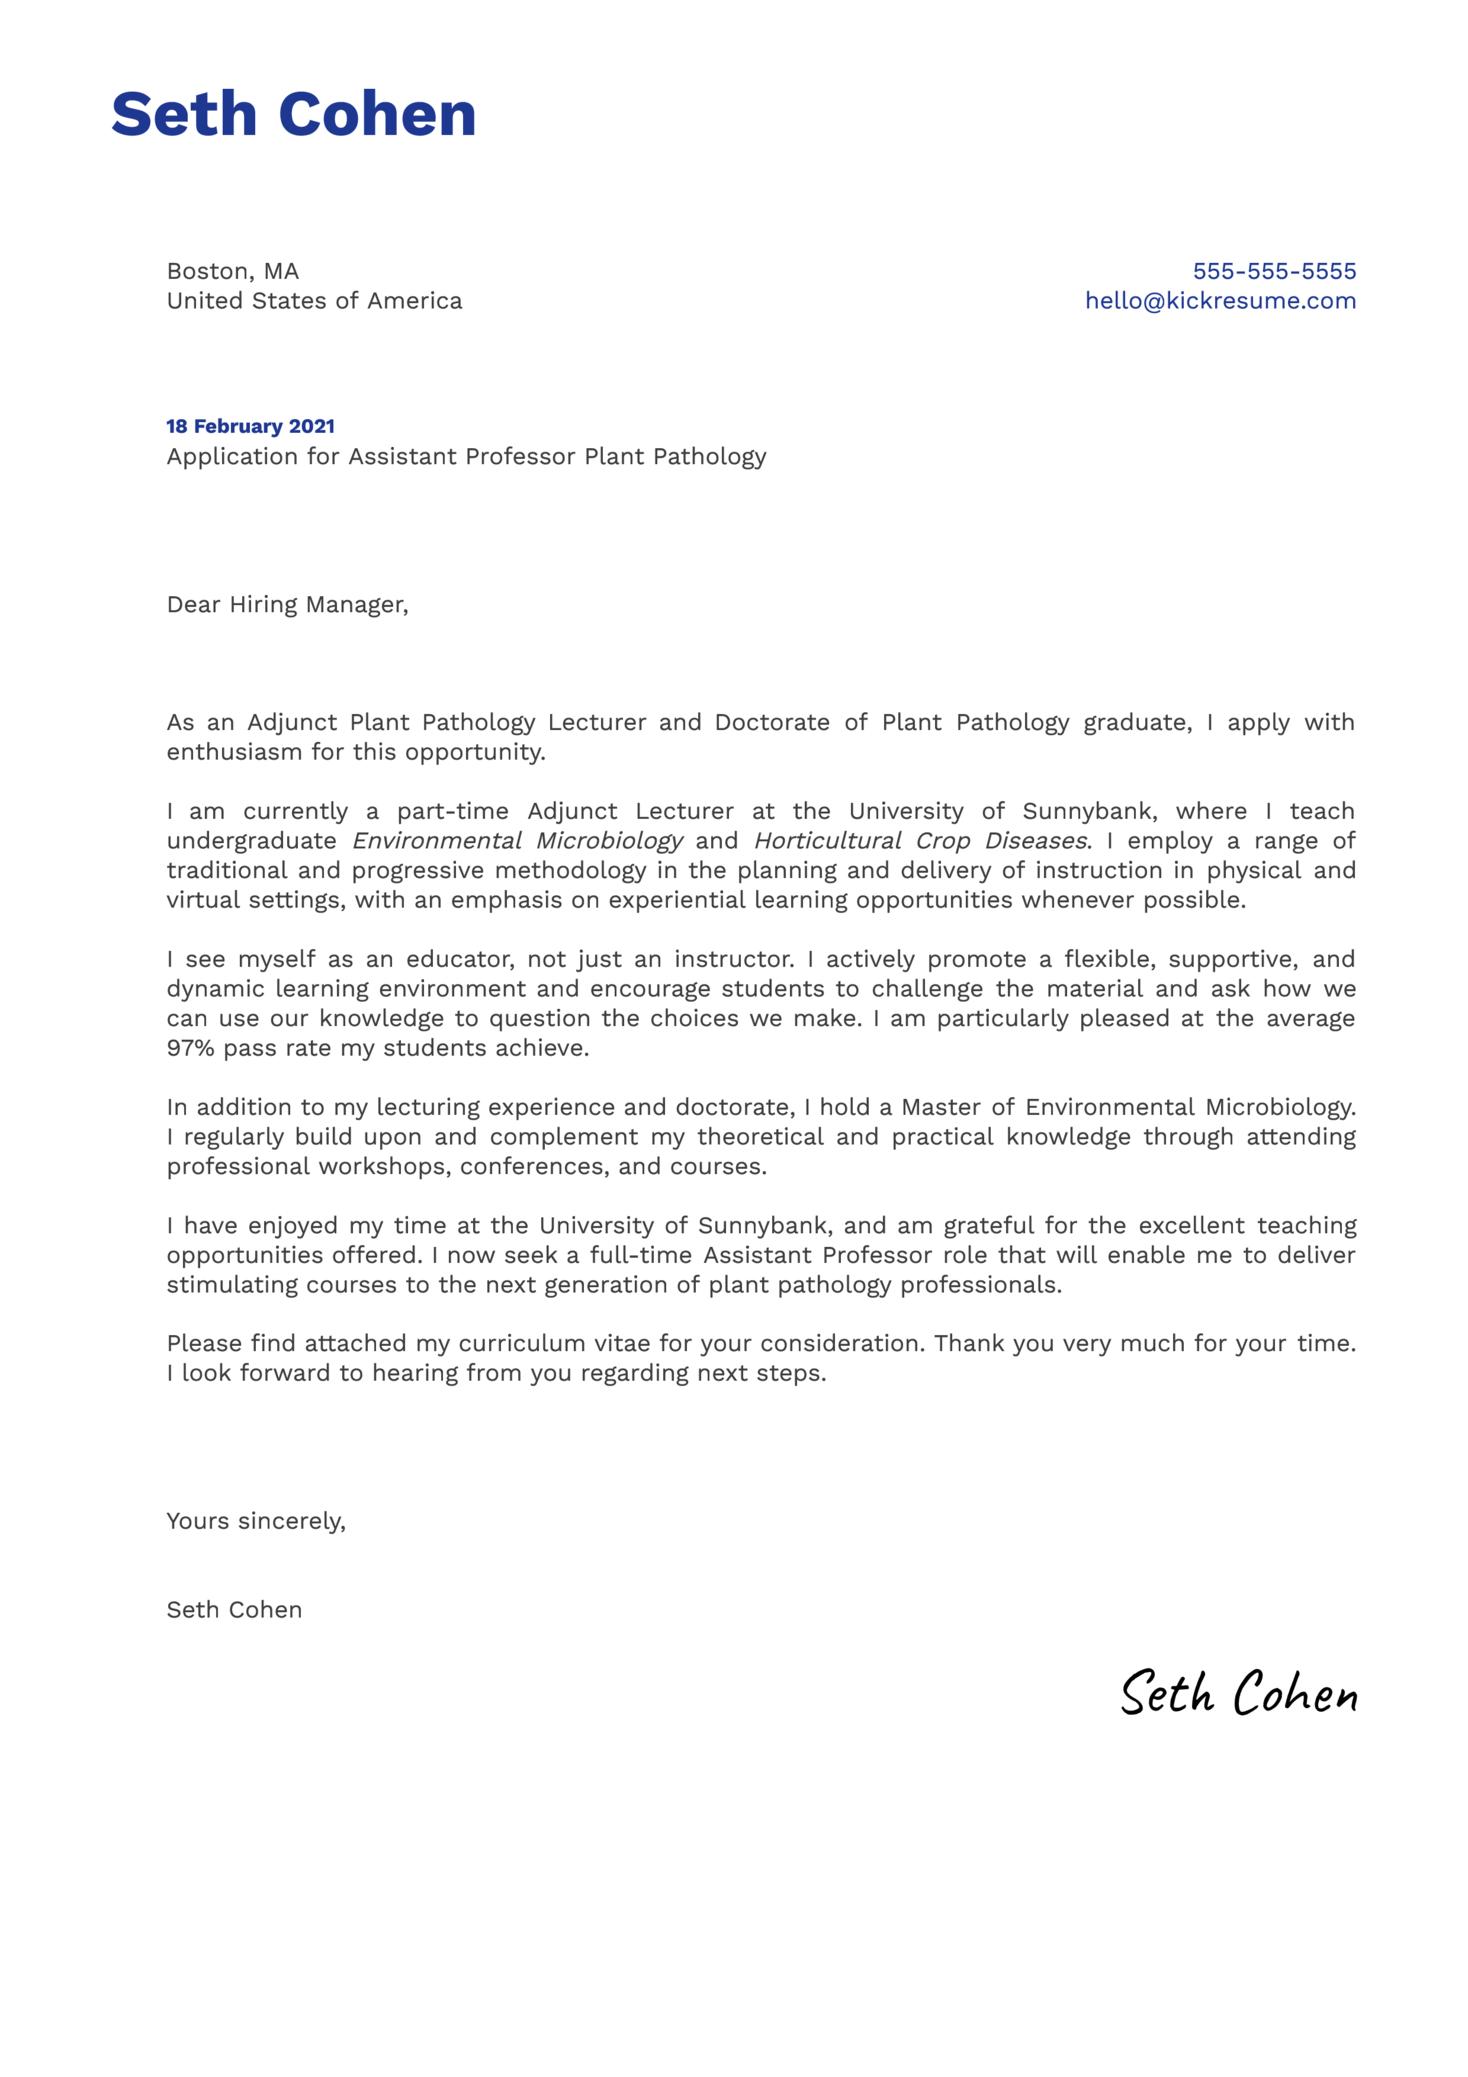 Assistant Professor Plant Pathology Cover Letter Example